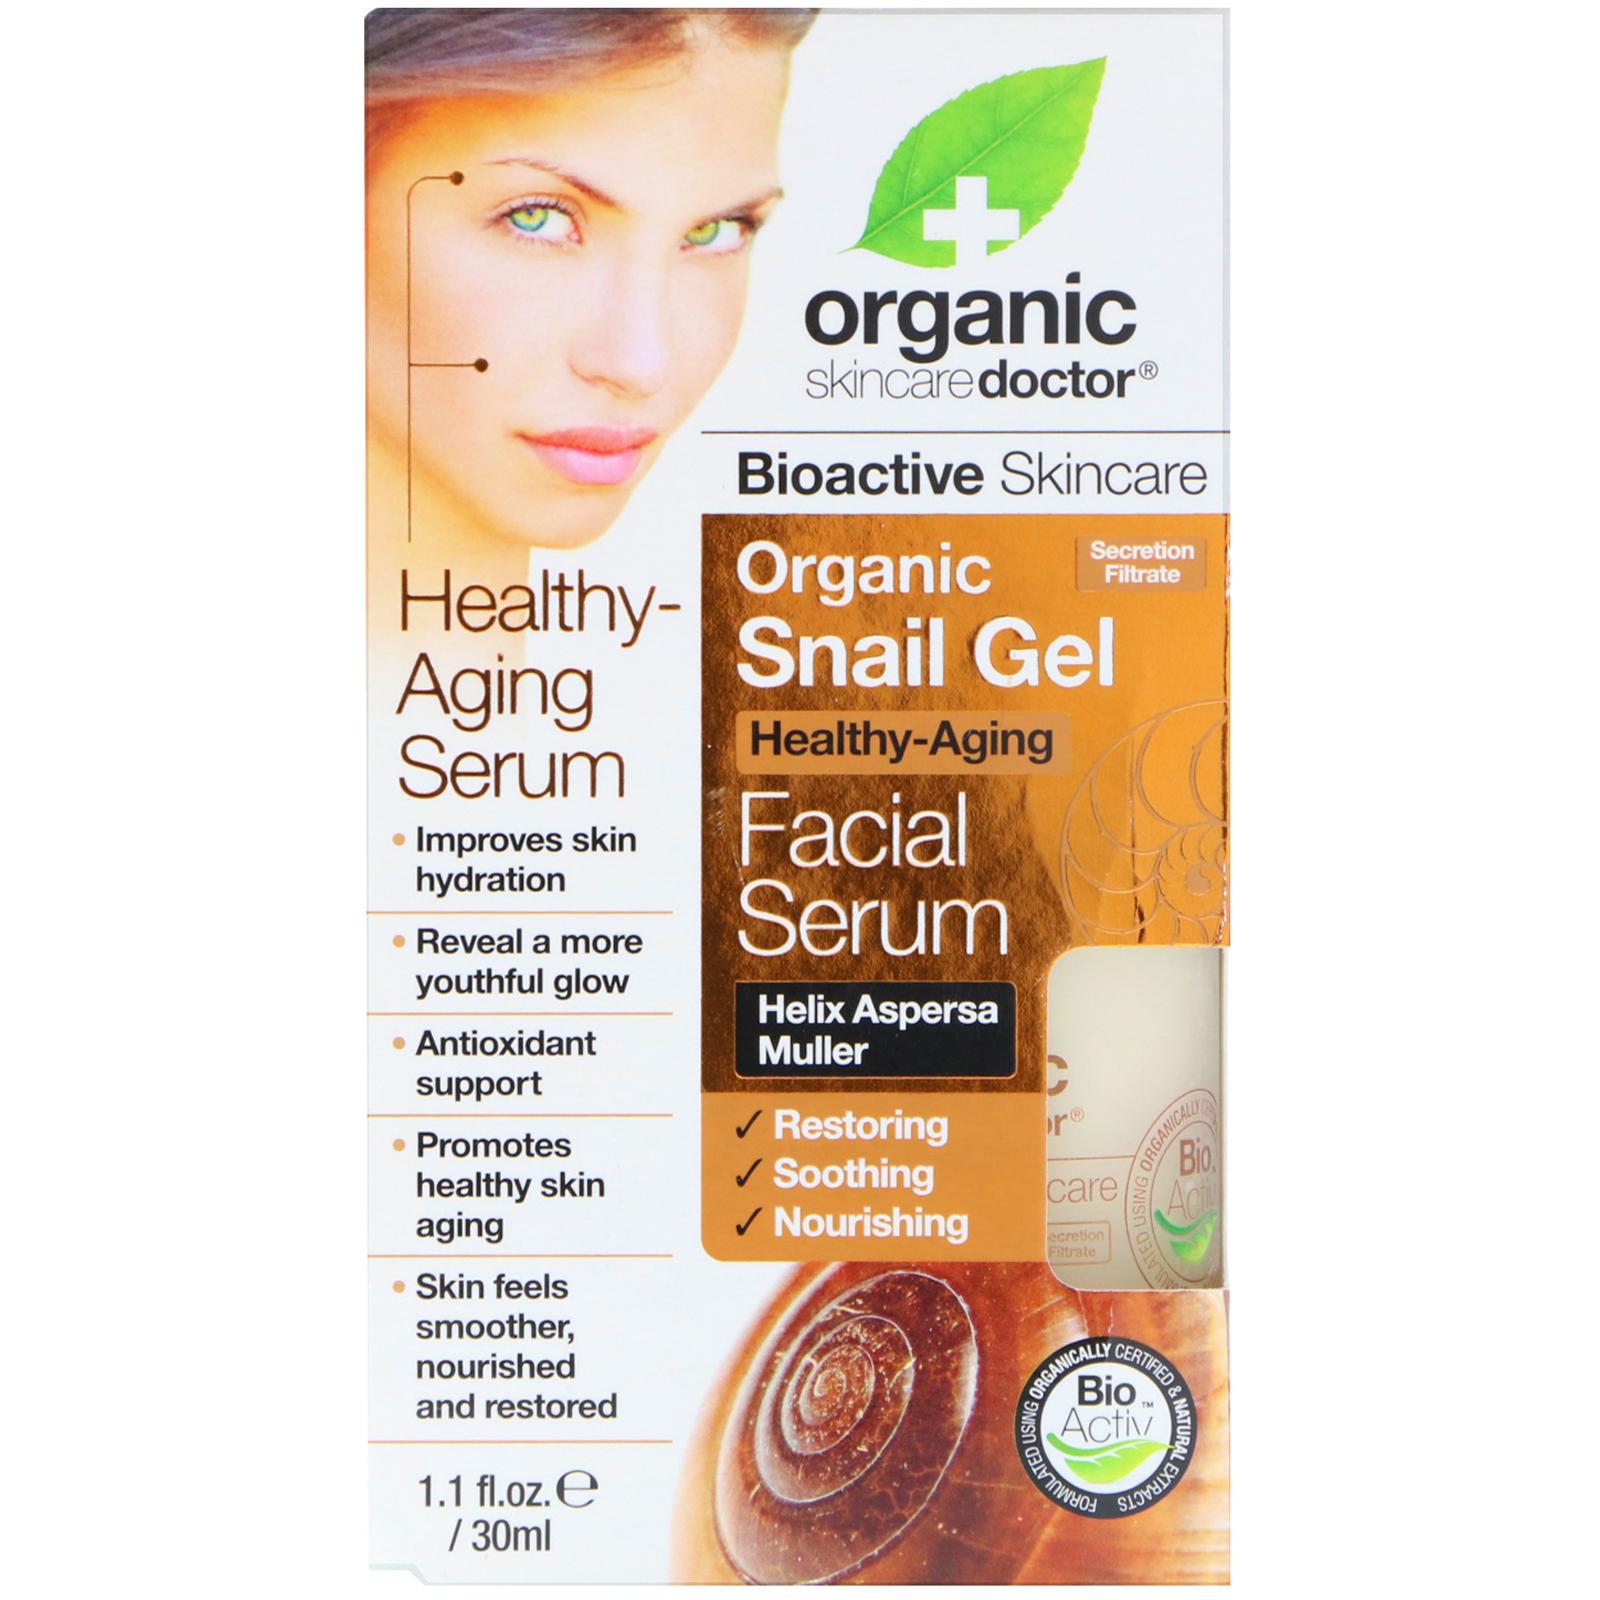 Organic Doctor Snail Gel Facial Serum 11 Fl Oz 30 Ml Secretion Filtrate Moisture Cream